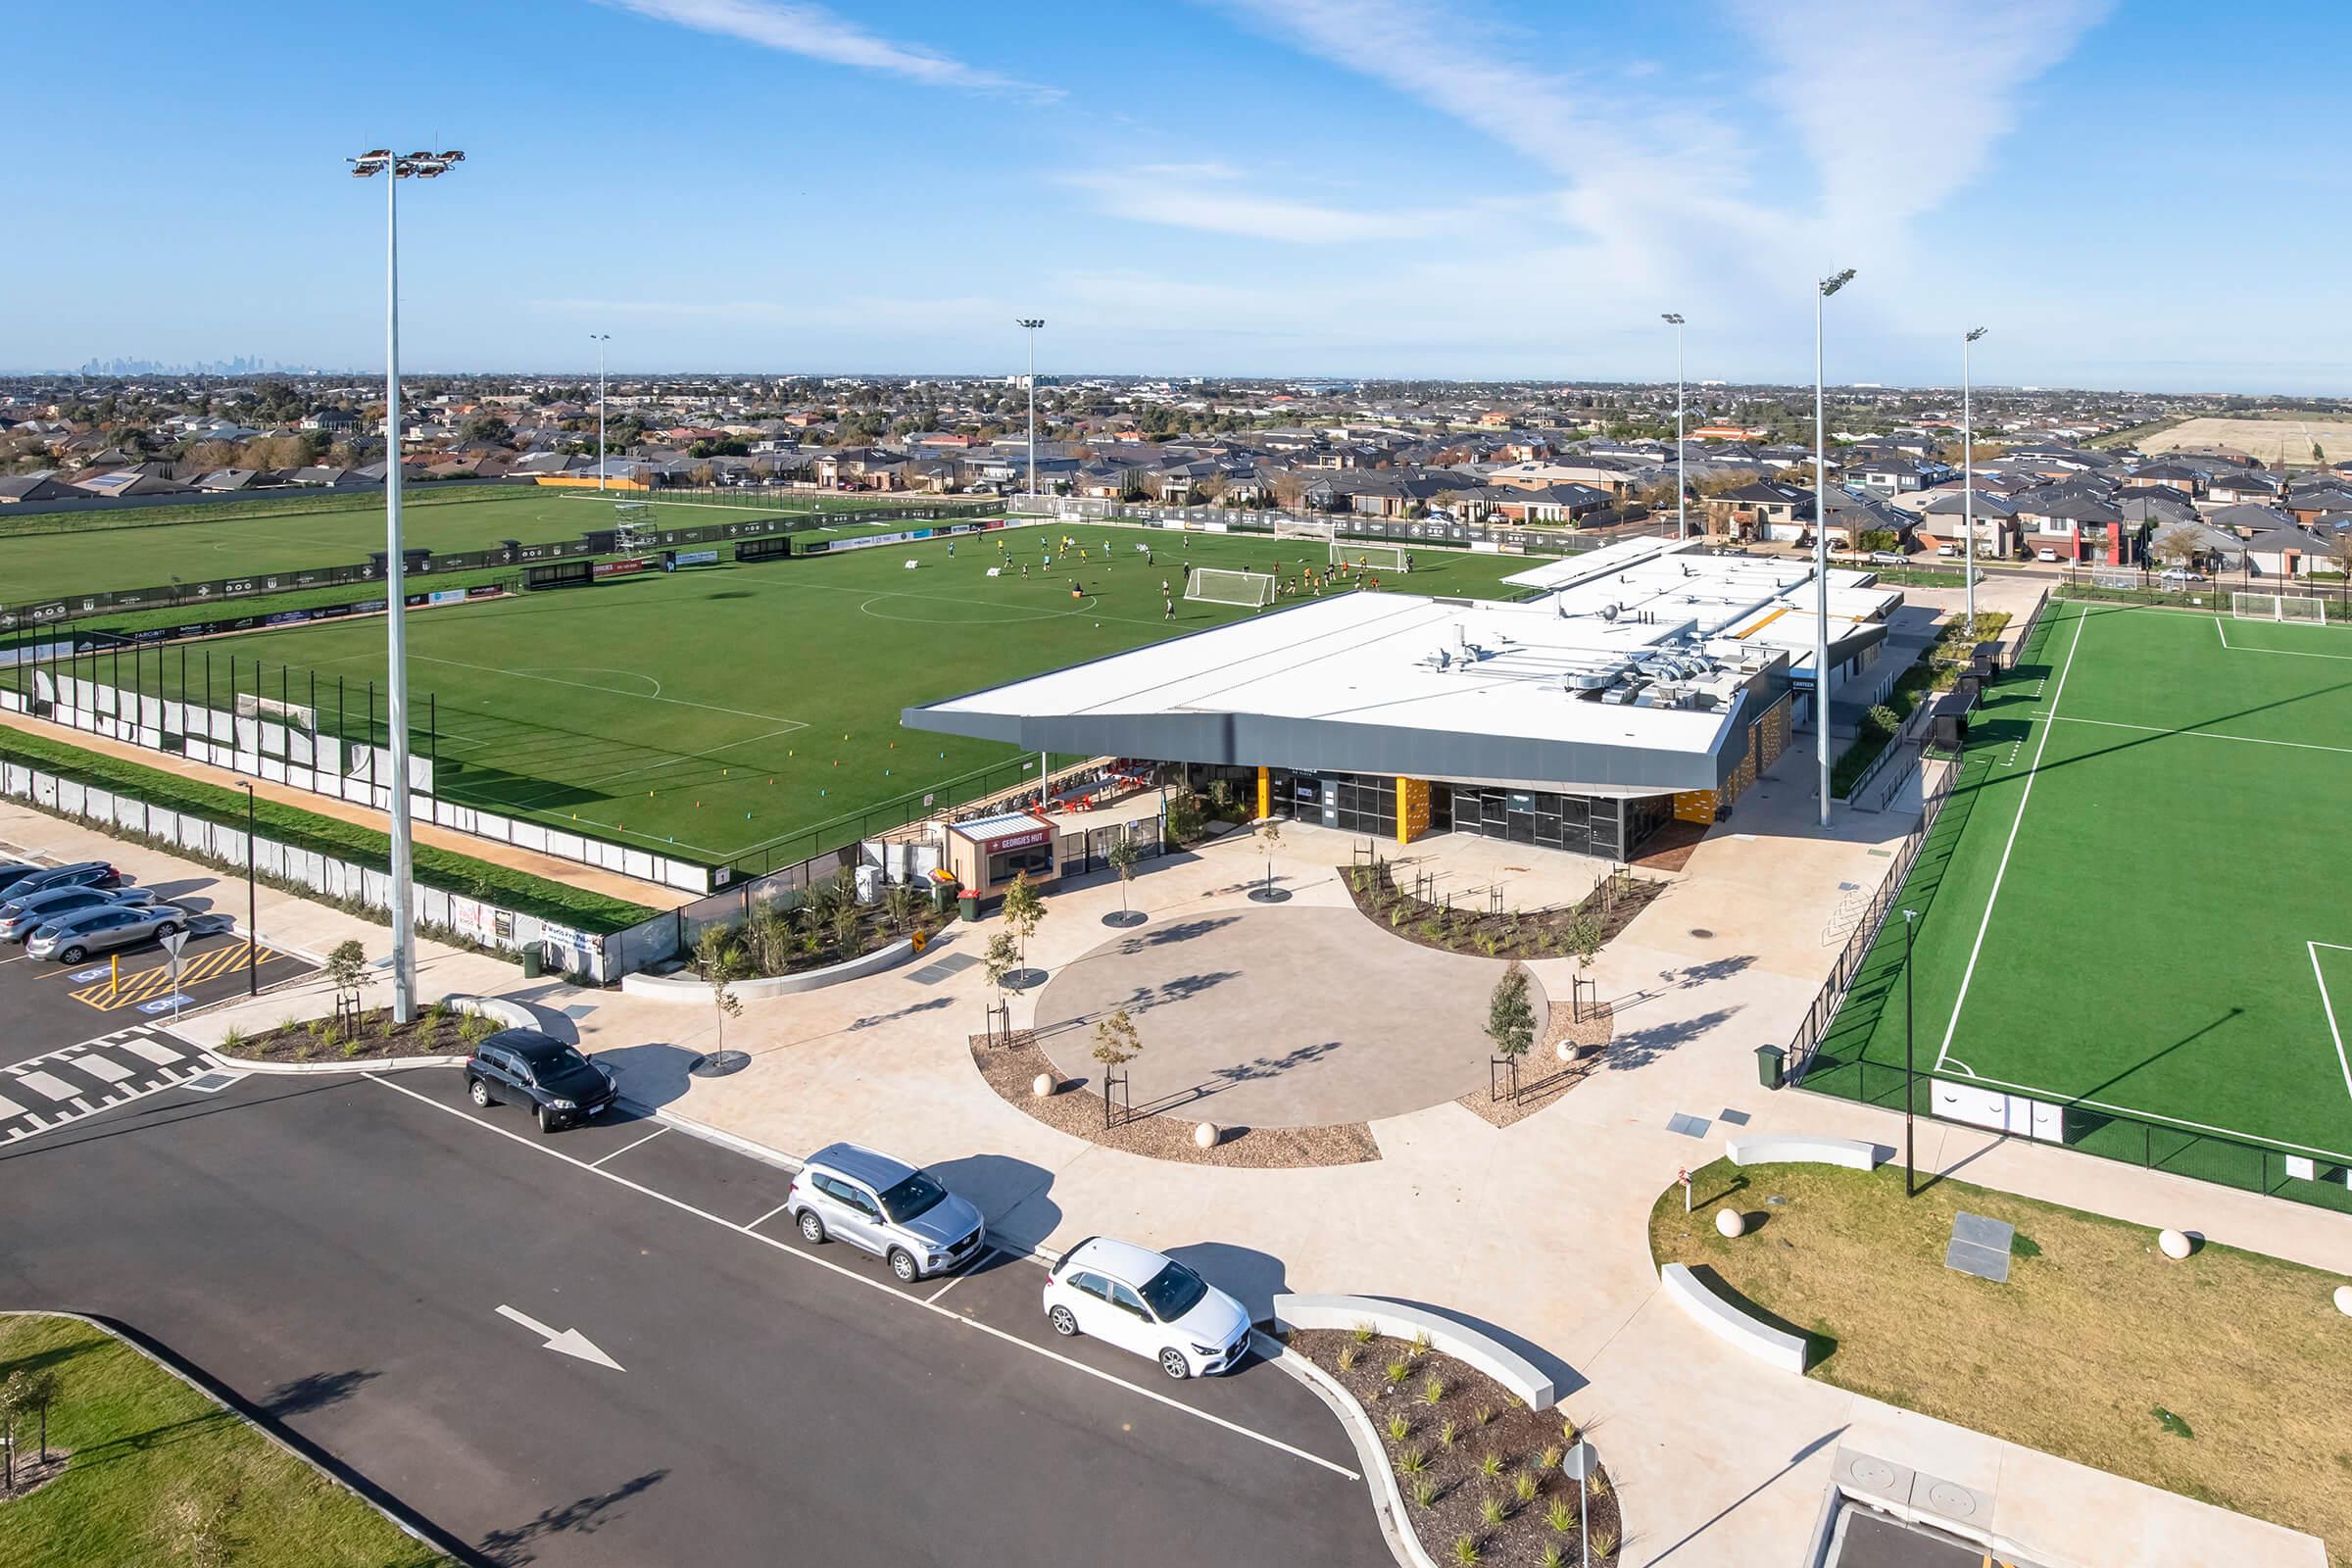 Sporting ground